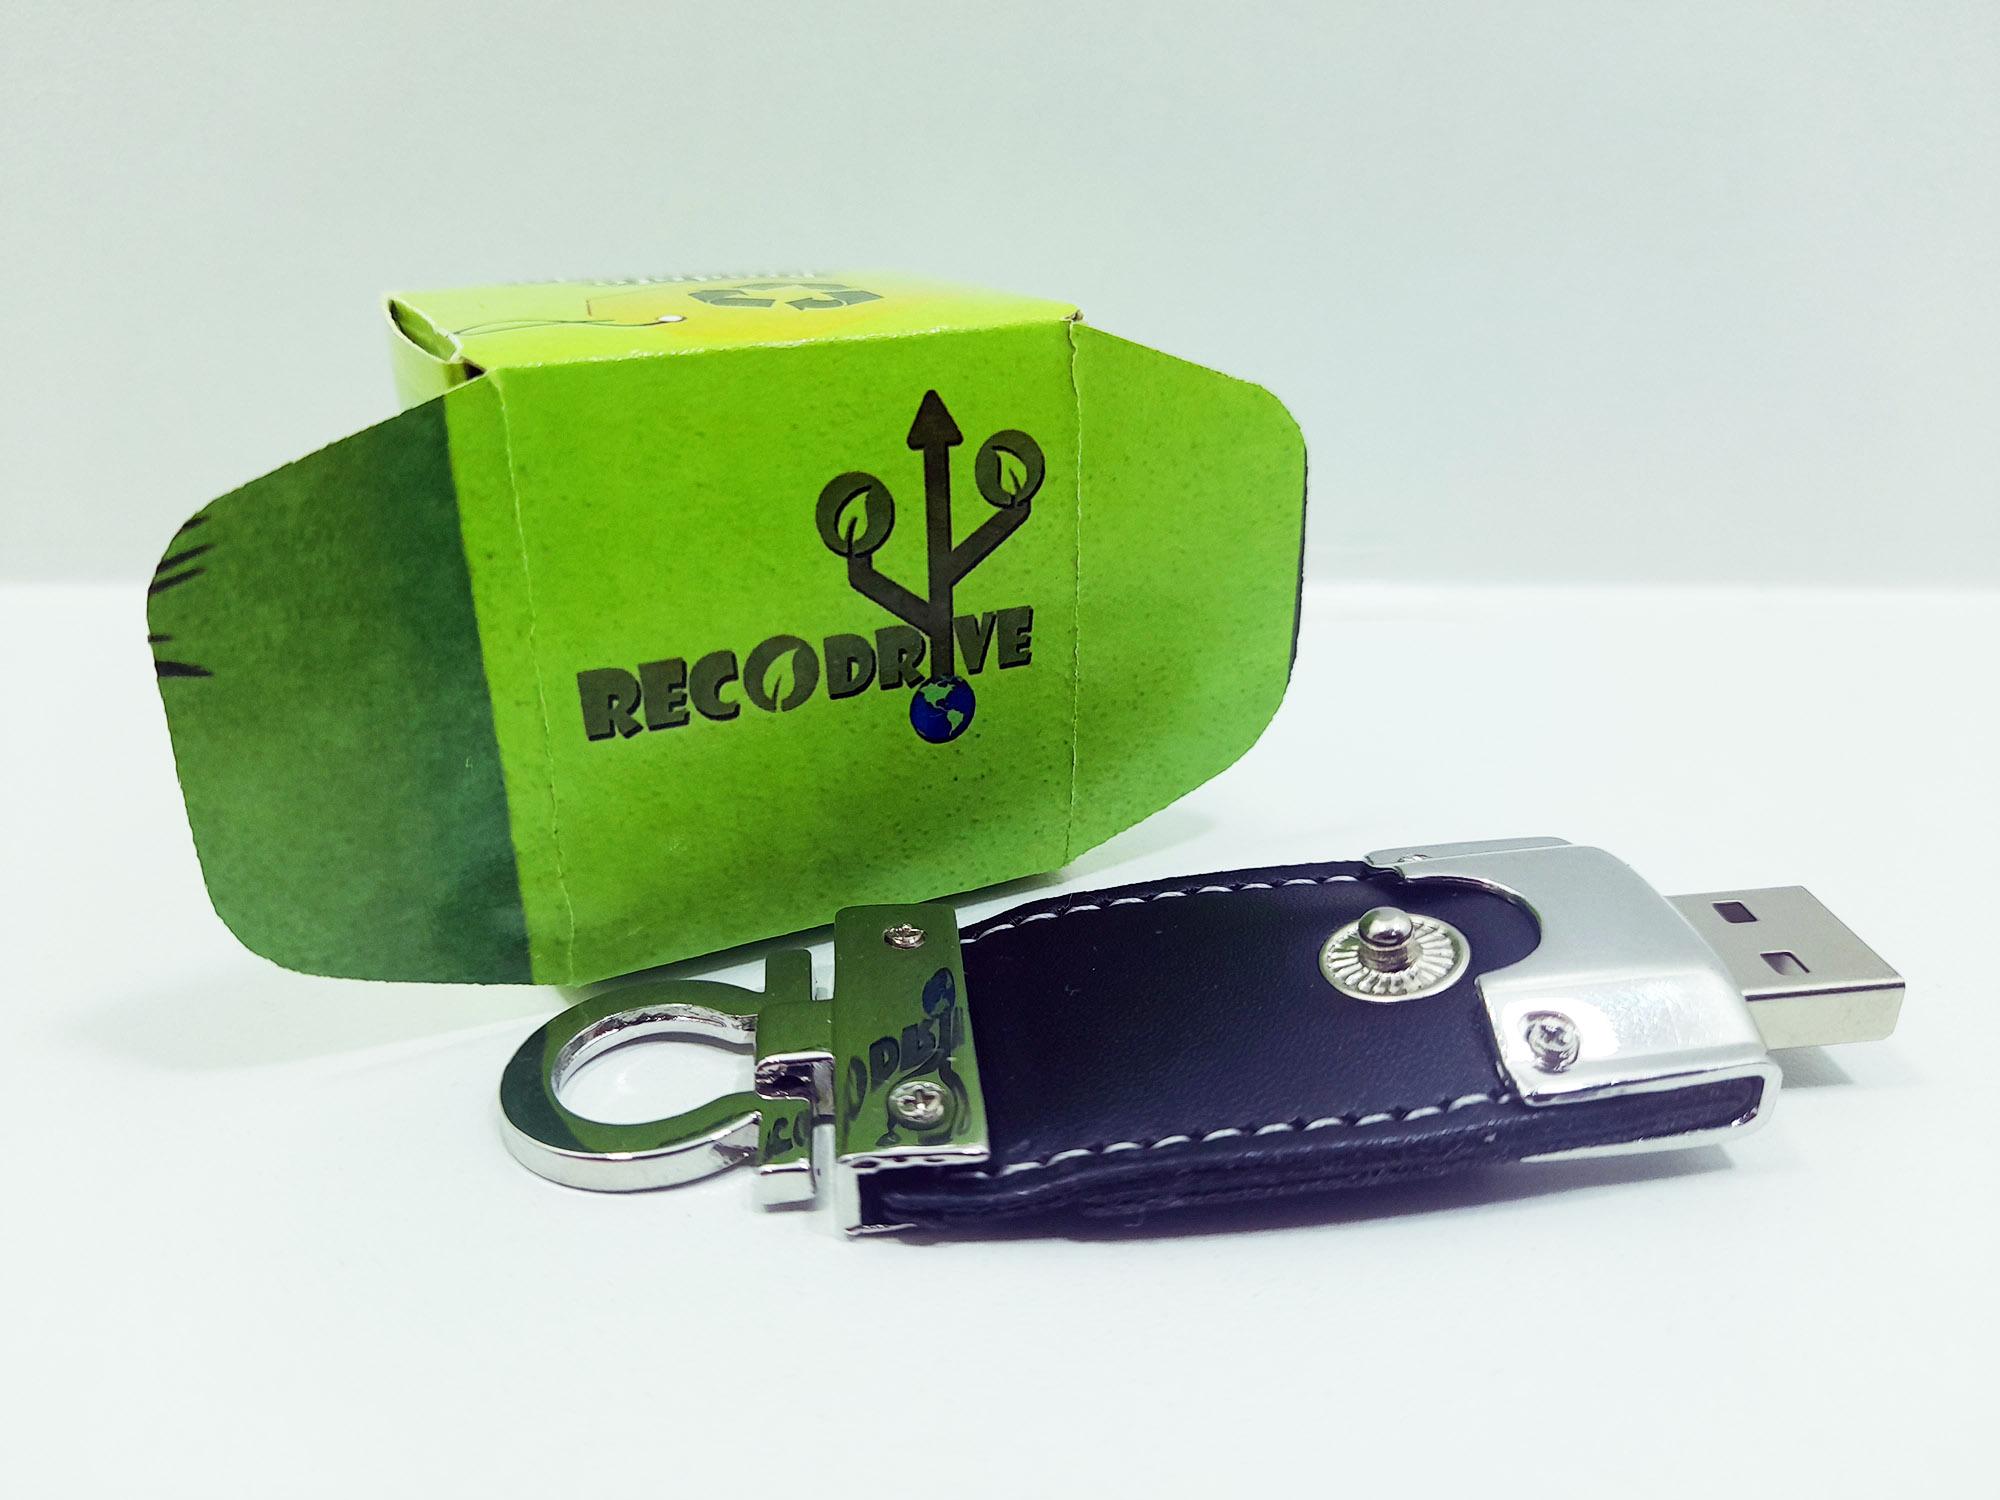 Linha rECOdrive - Pendrives Ecologicos Sustentáveis - Fit Elegance 8 GB e 16 GB - Exclusivo